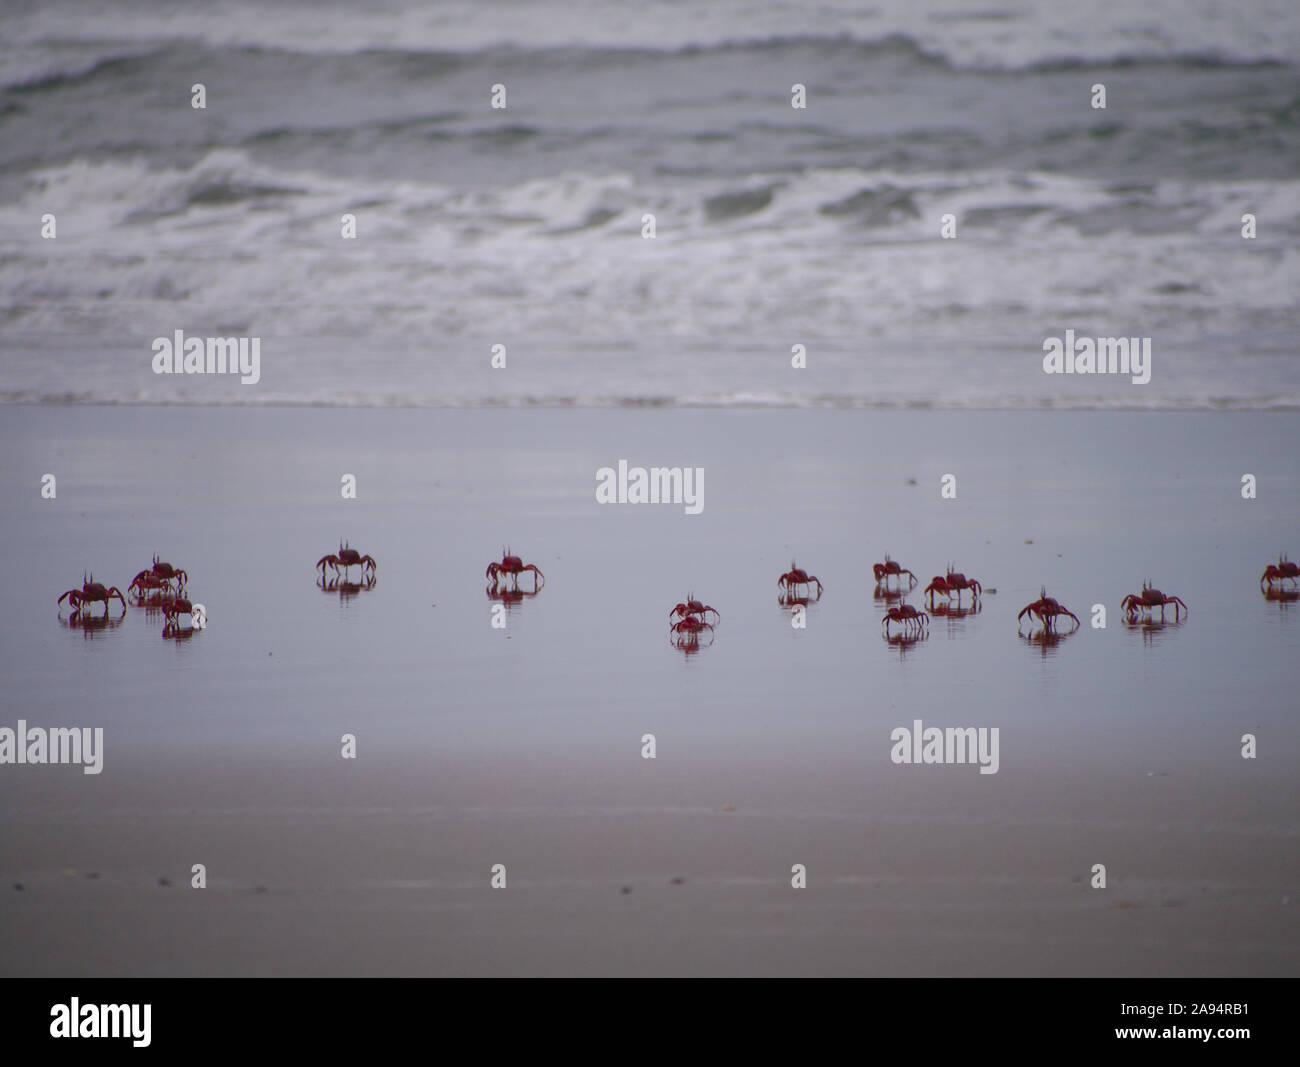 Red Ghost Crabs run through the surf in Cox's Bazar Beach Stock Photo